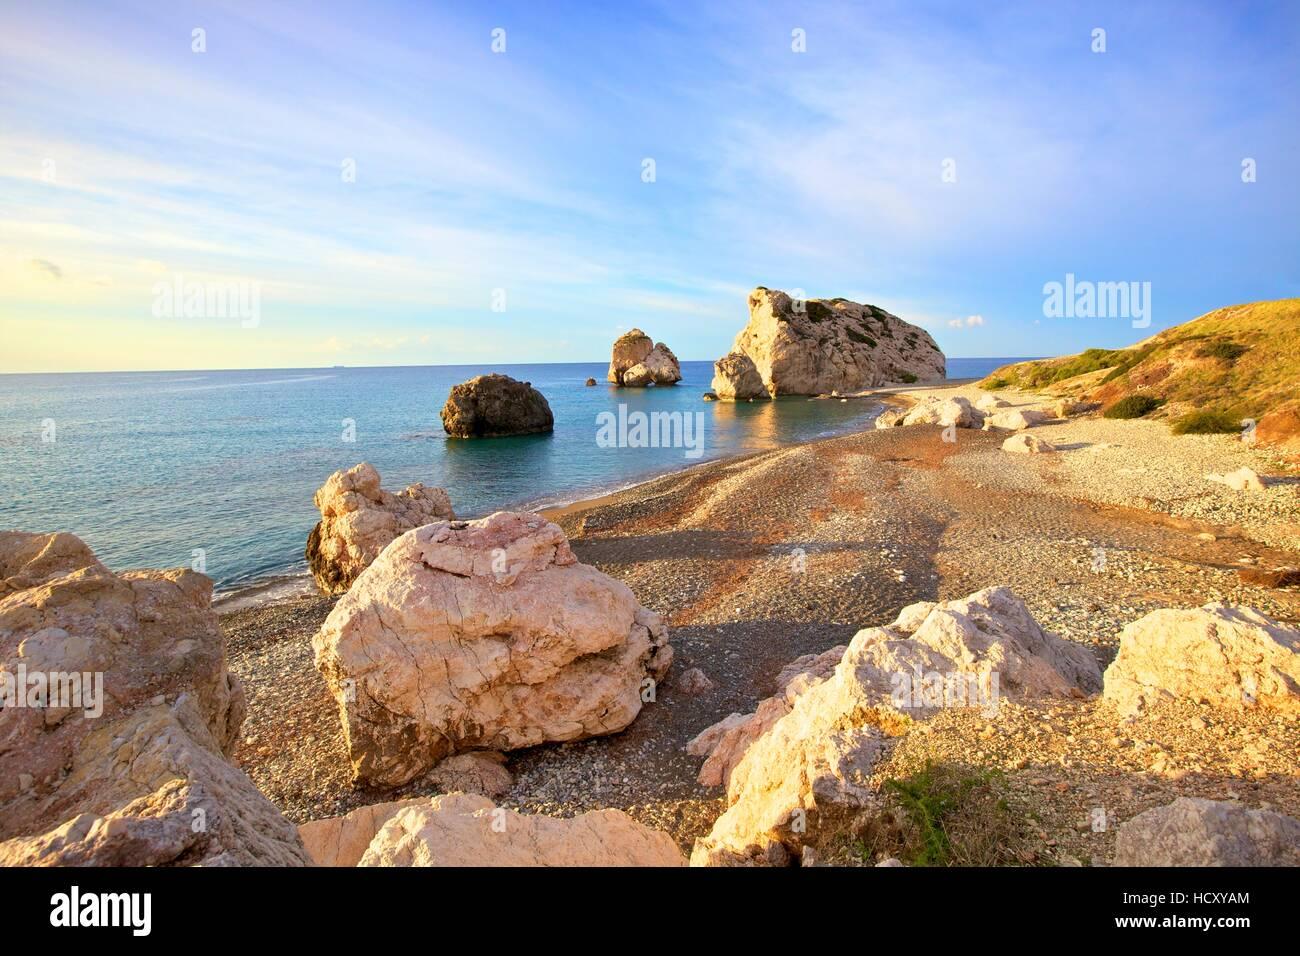 Aphrodites Rock, Paphos, Cyprus, Eastern Mediterranean Sea Stock Photo